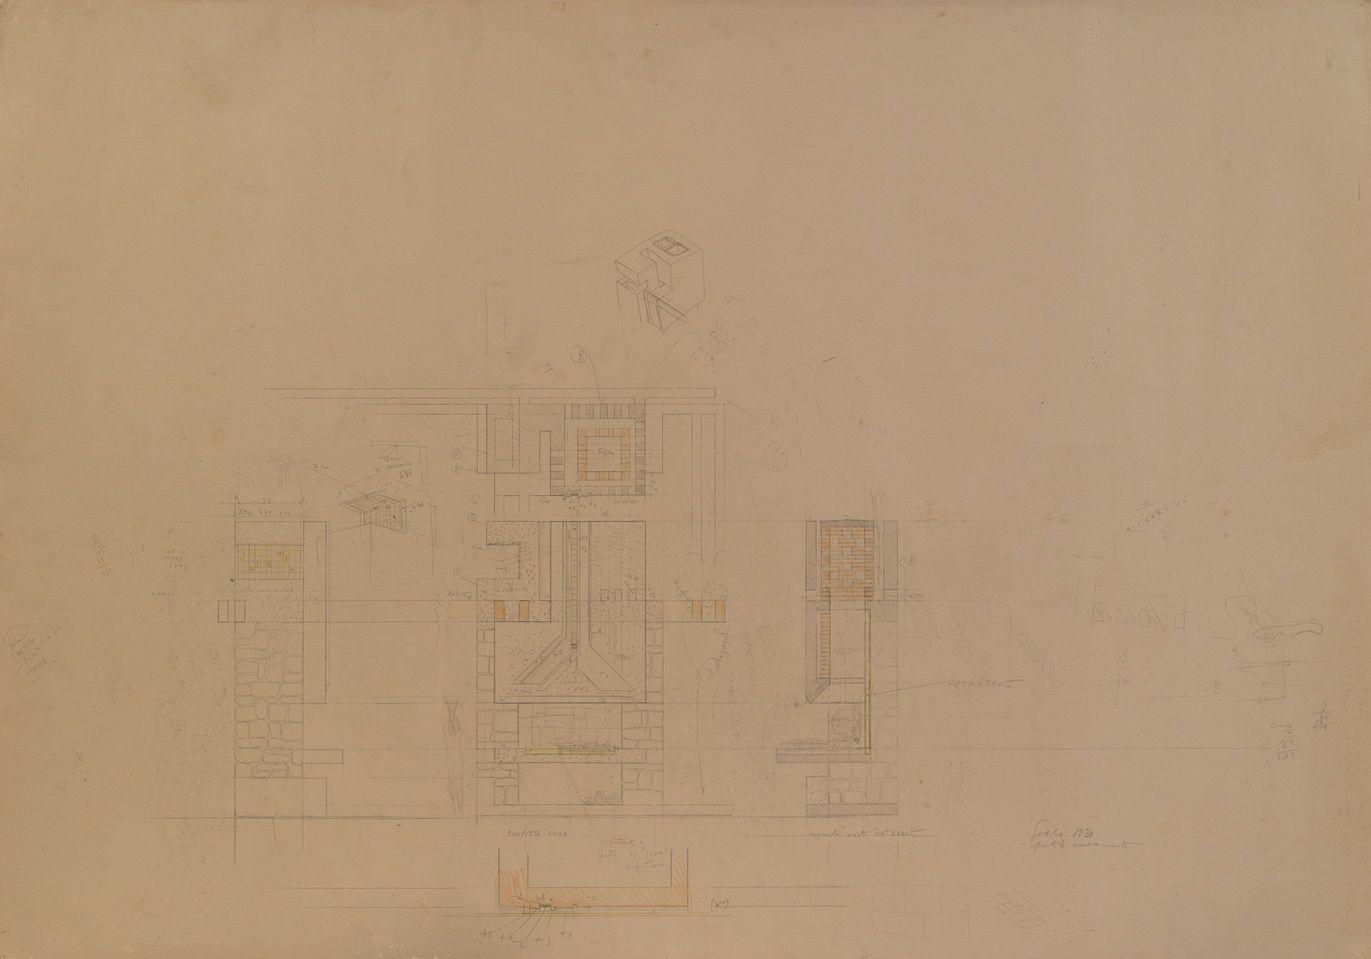 Unseen drawings of Carlo Scarpa's Villa Ottolenghi in 2020